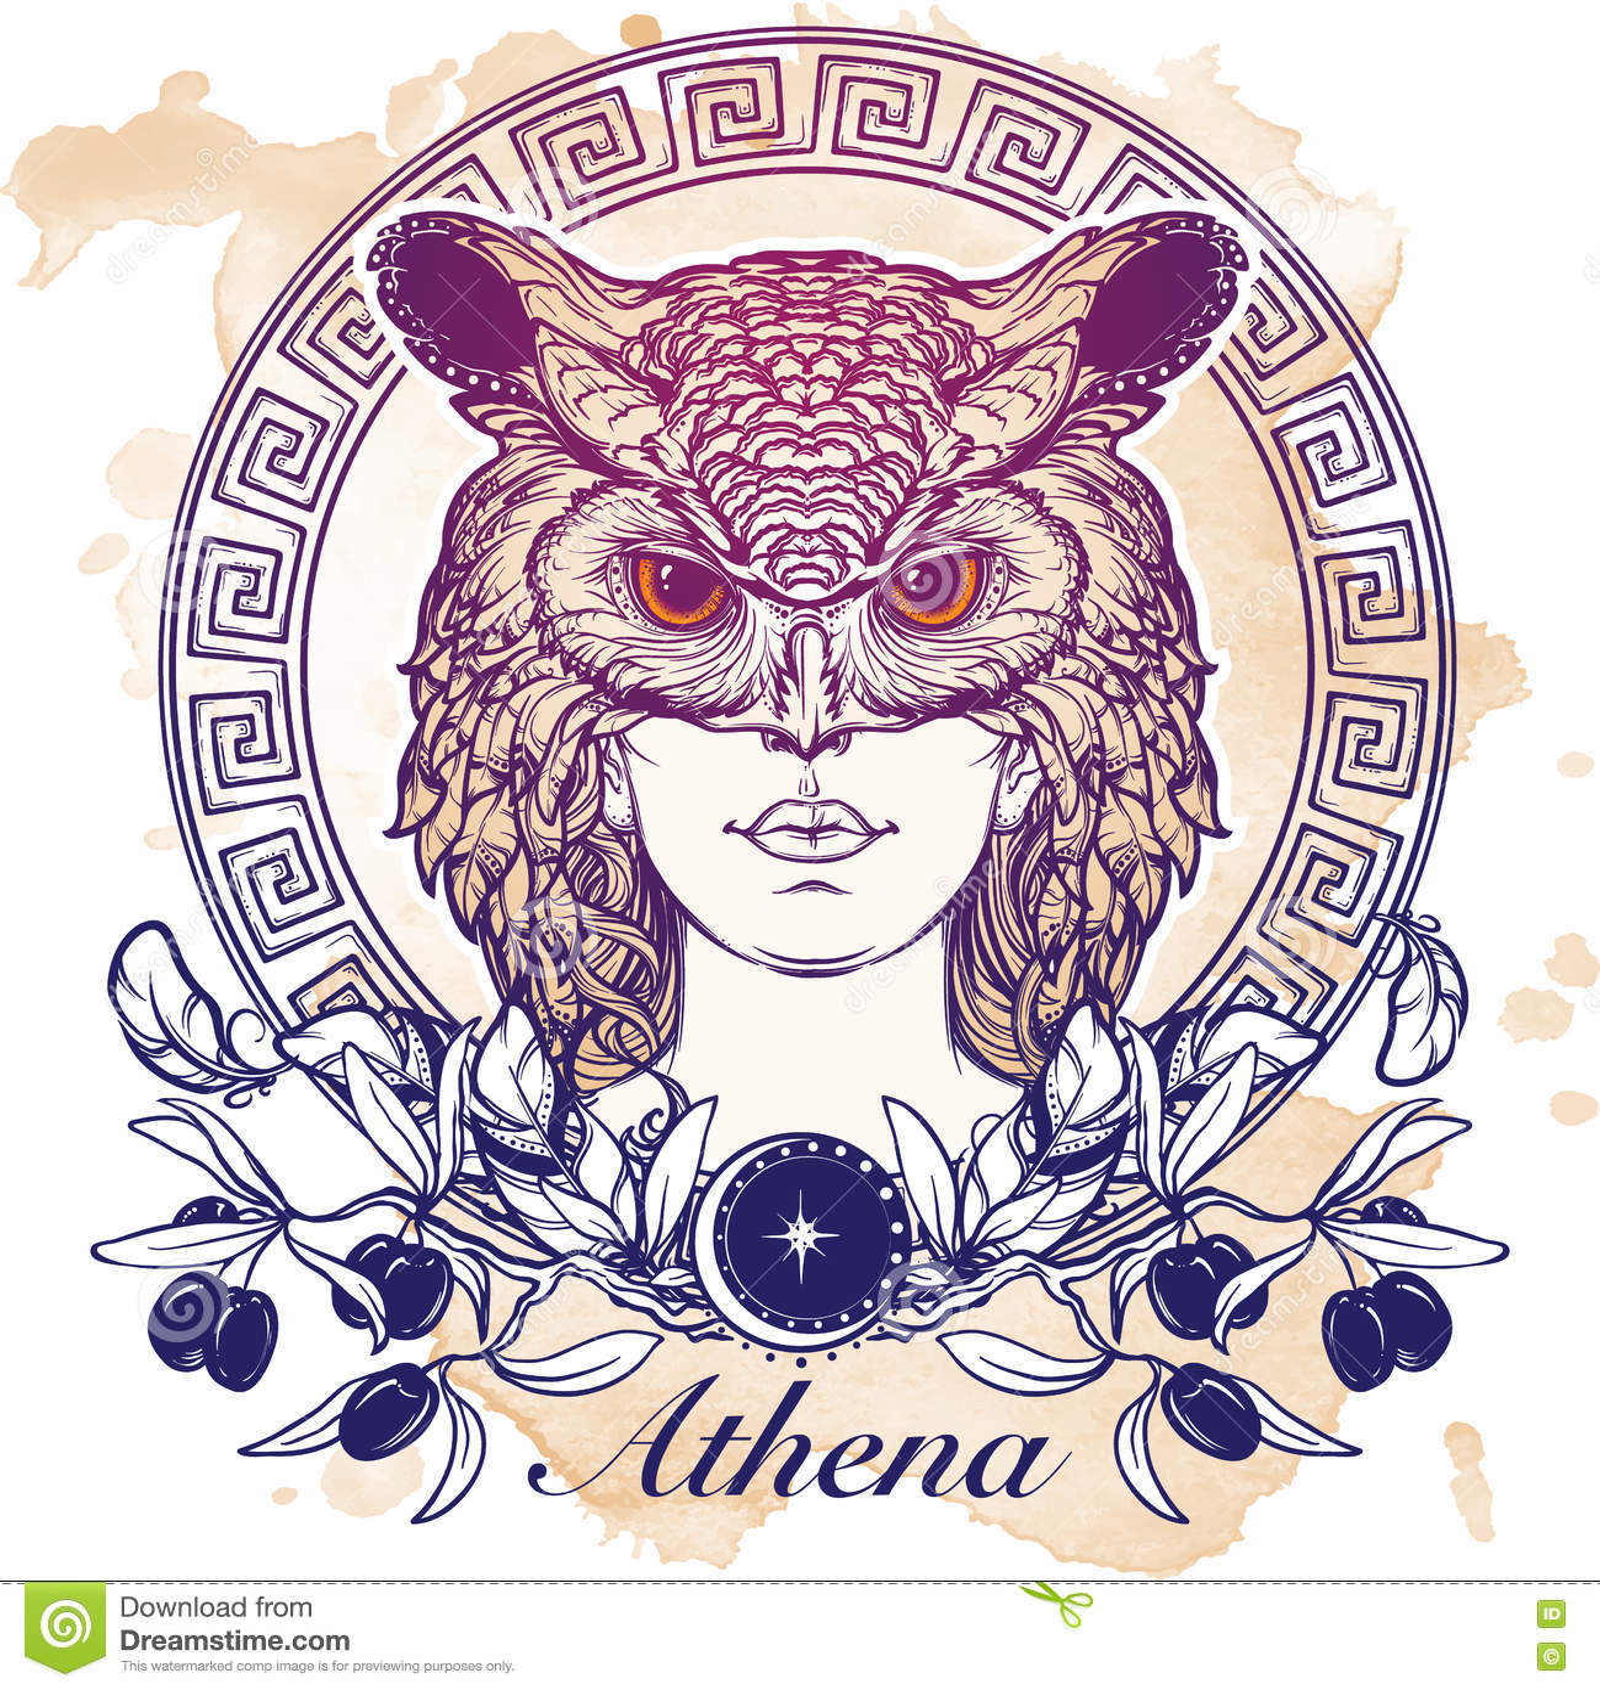 Athena Sketch Isolated On Grunge Background Stock